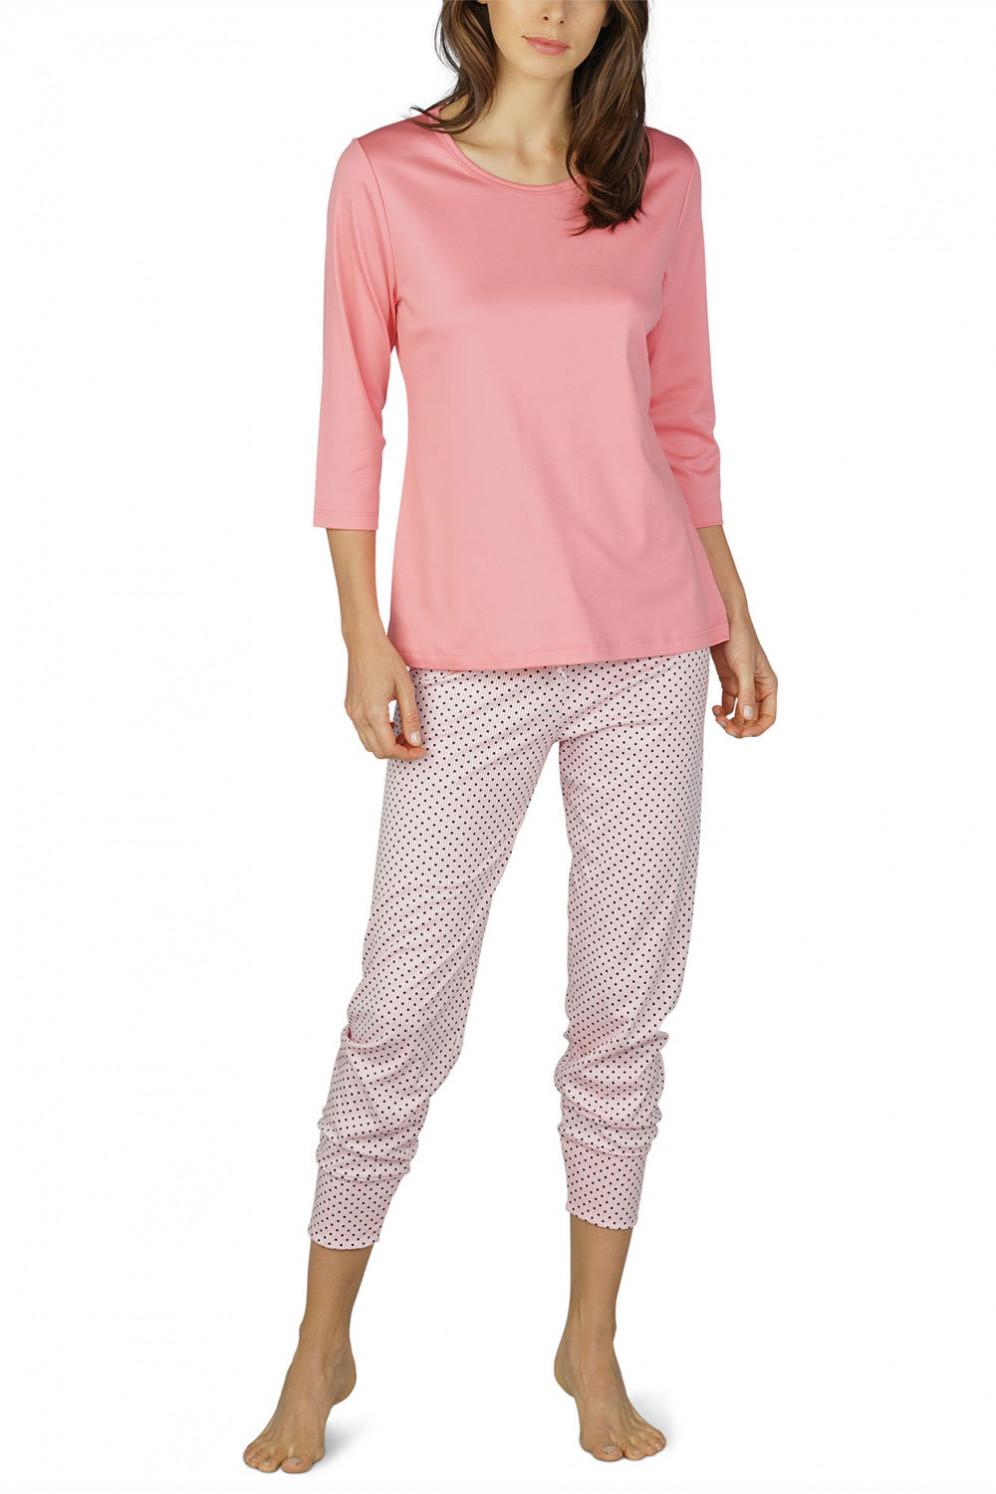 0d7dc41b06 Vergrößern Abbildung zu Pyjama 7/8, 3/4-Ärmel (13954) der ...